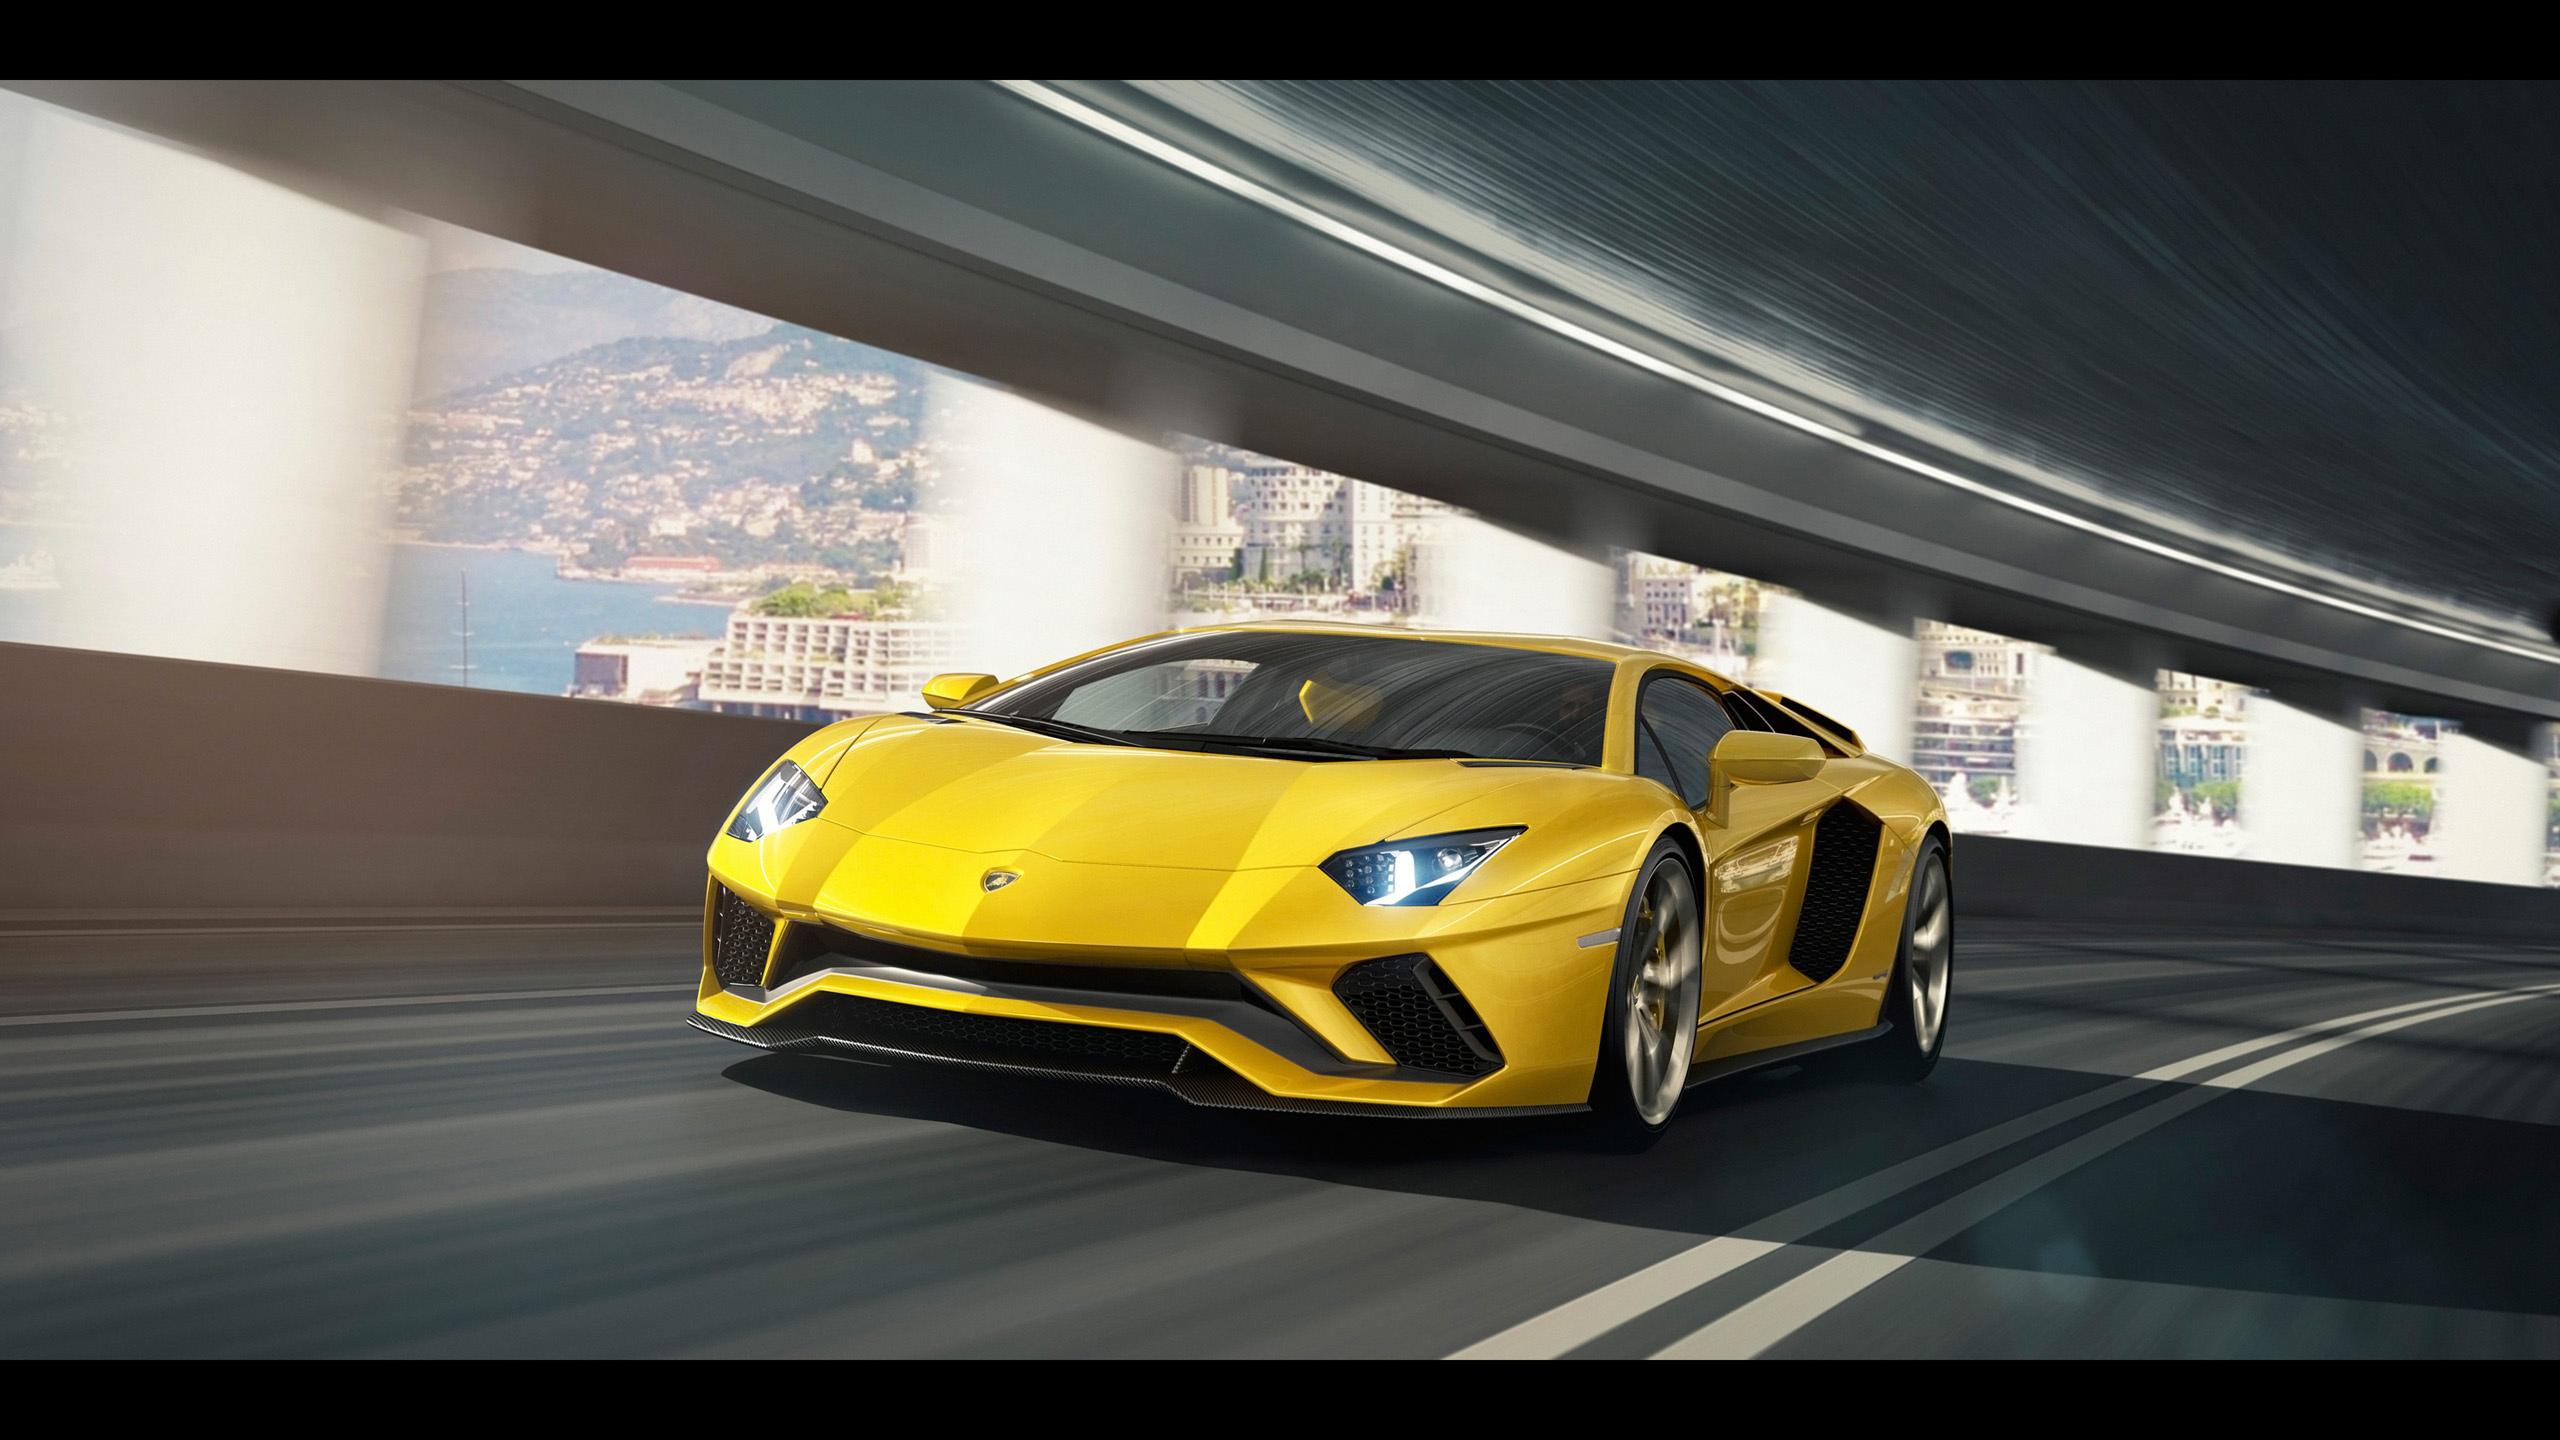 2017 Lamborghini Aventador S 2 Wallpaper Hd Car Wallpapers